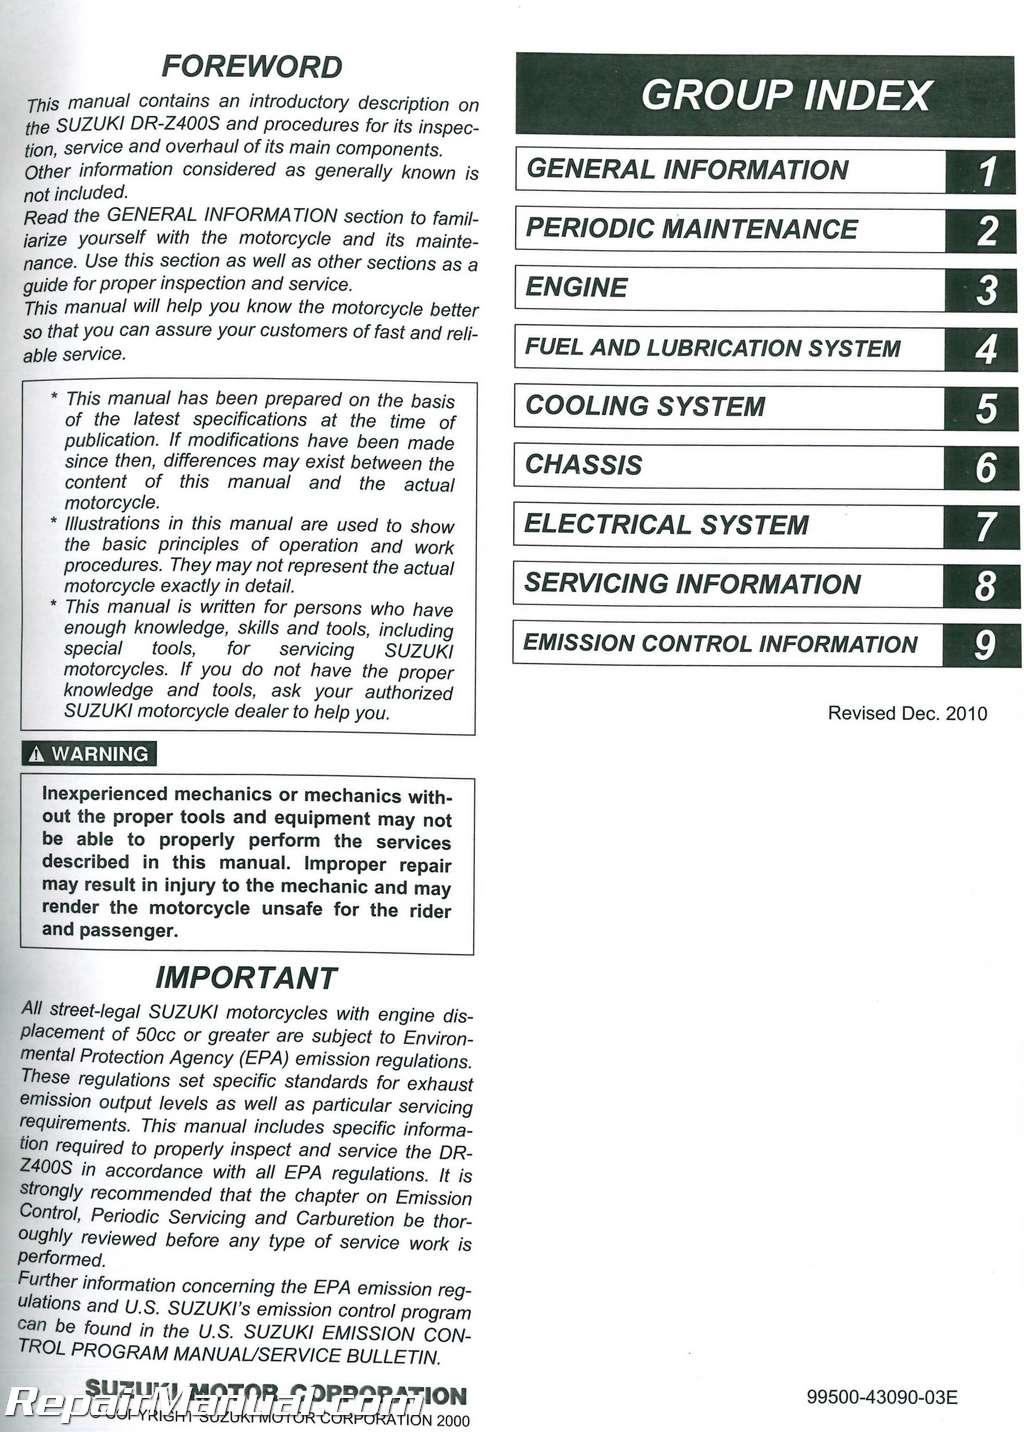 2005-2011 Suzuki DR-Z400SM SuperMoto 2000-2011 DR-Z400S Paper Service Manual